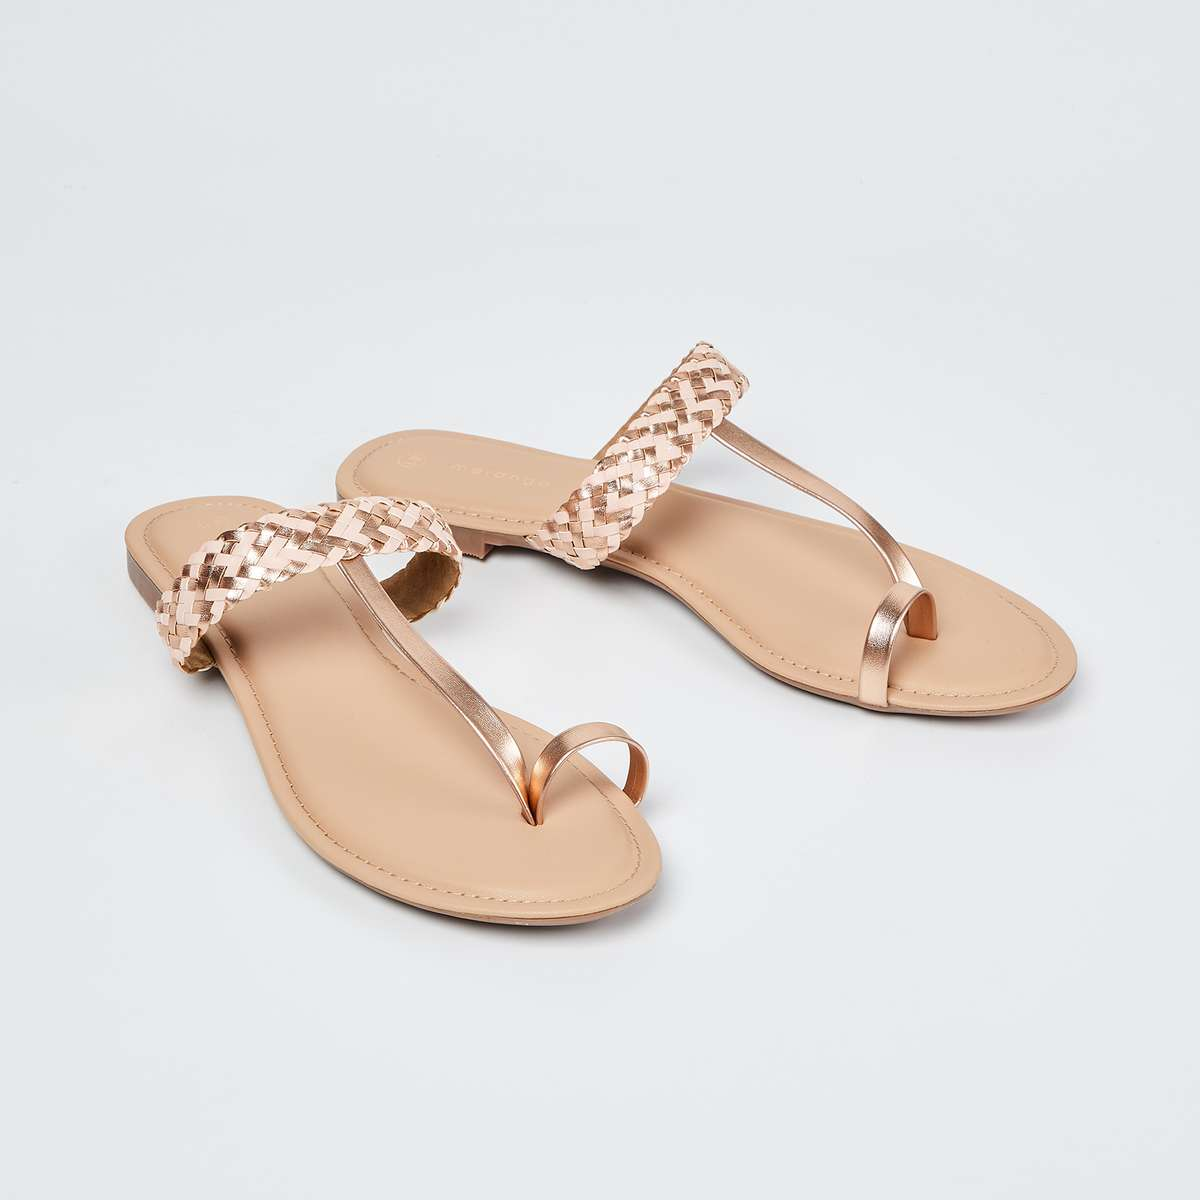 2.MELANGE Braided Toe-Ring Flat Sandals